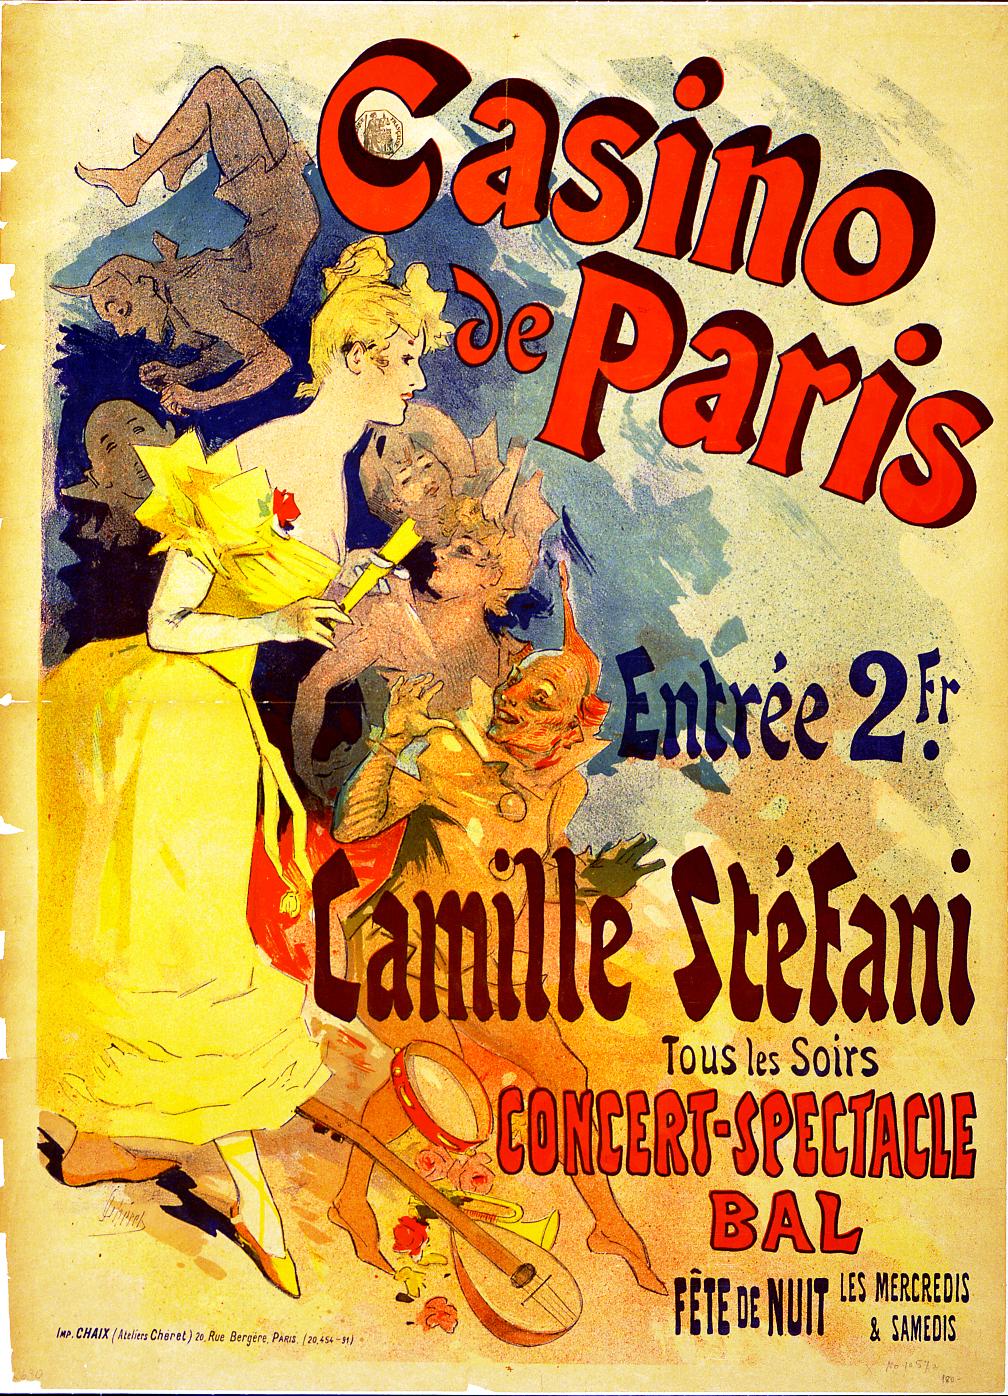 http://upload.wikimedia.org/wikipedia/commons/a/af/Casino_de_Paris_poster_-_Jules_Ch%C3%A9ret.jpg